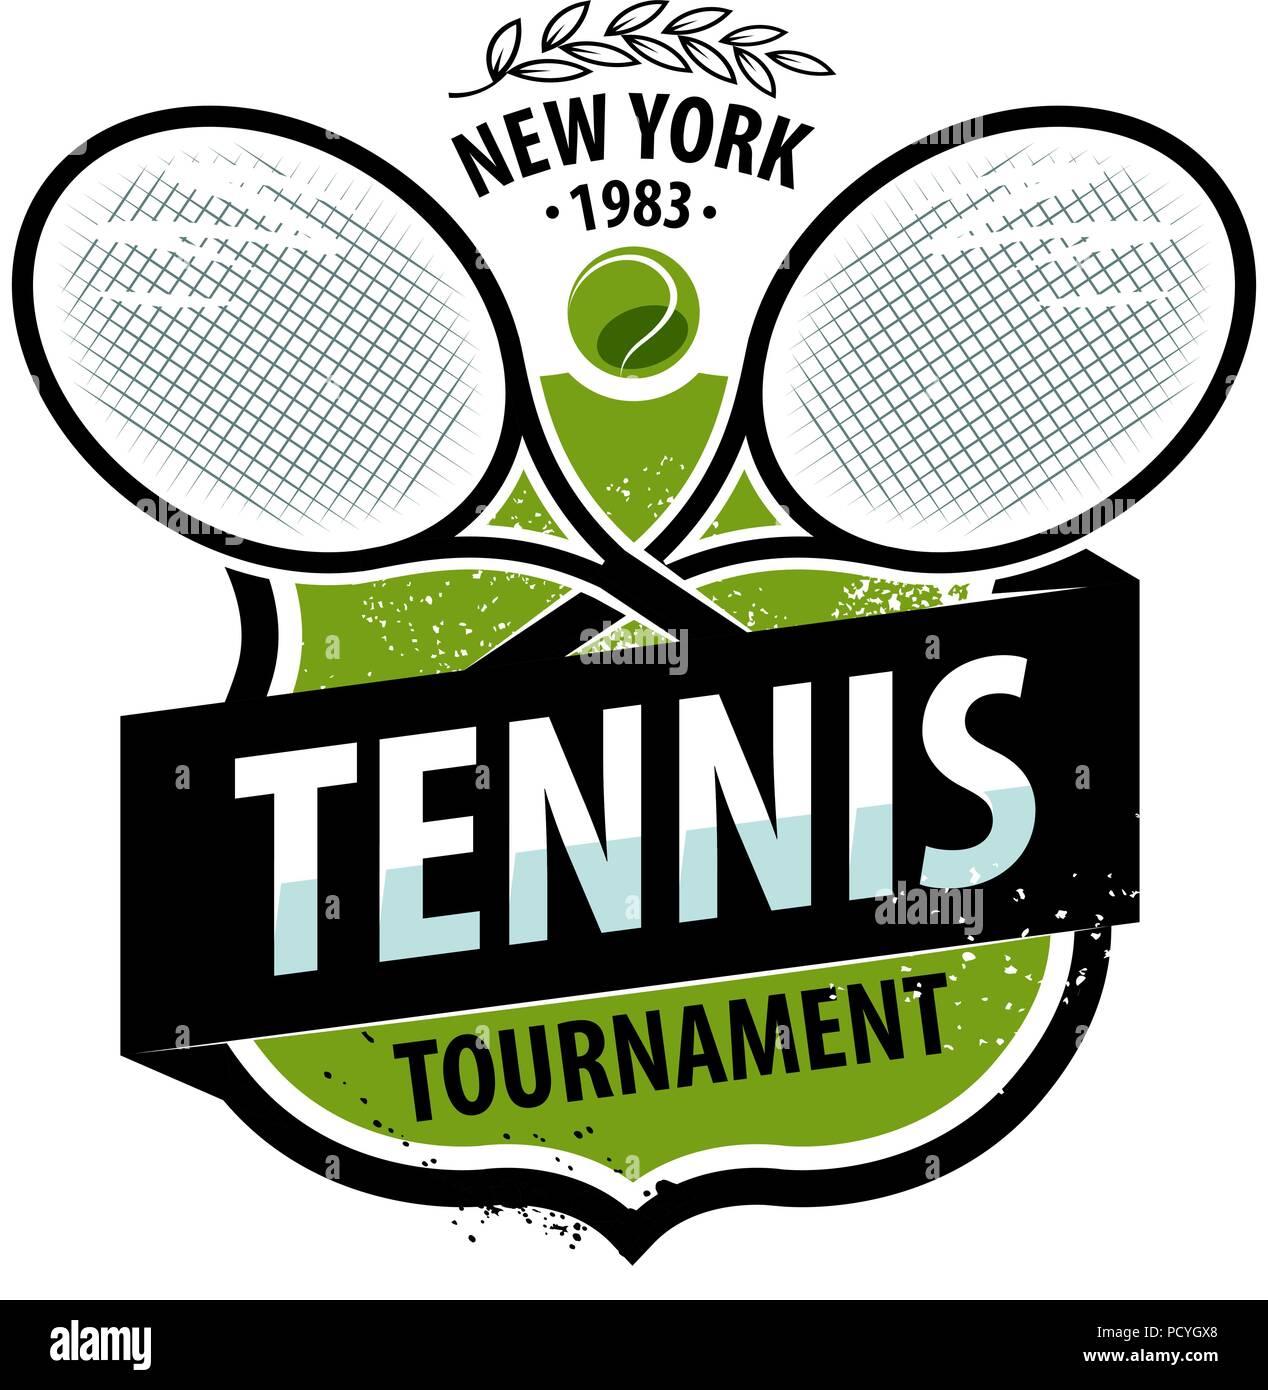 Tennis Logo Or Label Sport Concept Vector Illustration Stock Vector Image Art Alamy